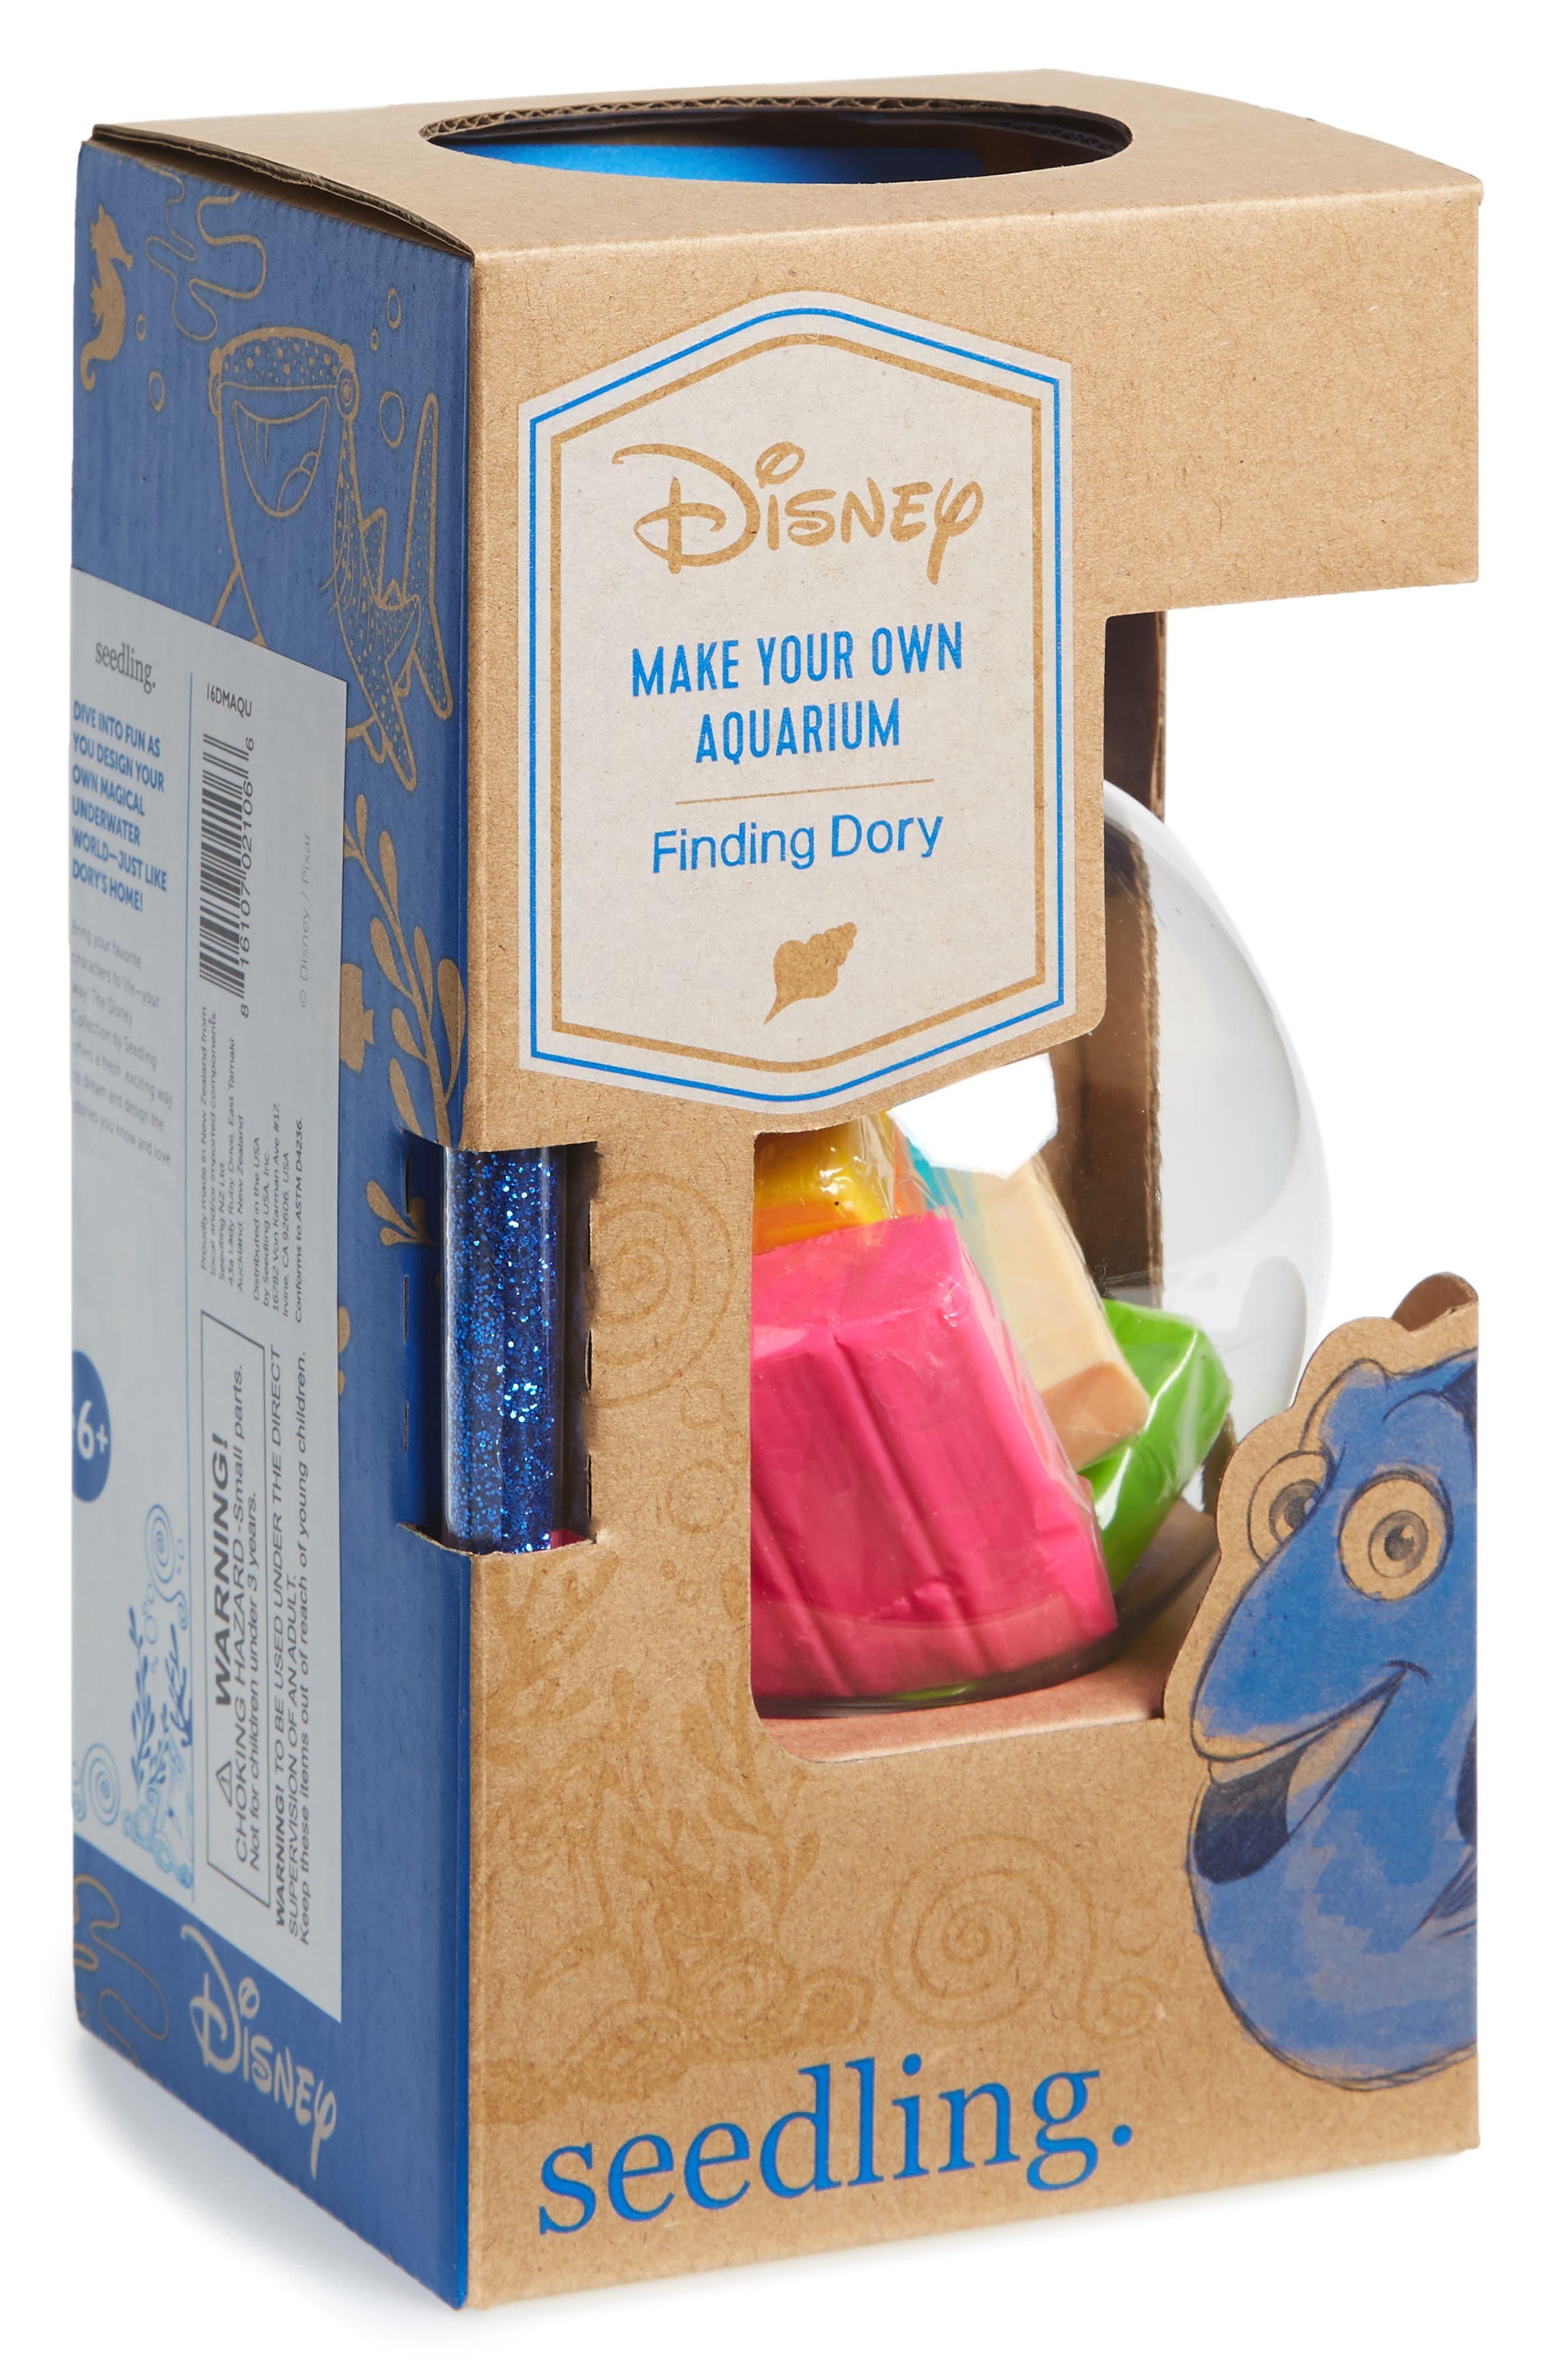 SEEDLING Disney Finding Dory Make Your Own Aquarium Craft Kit, Main, color, 250